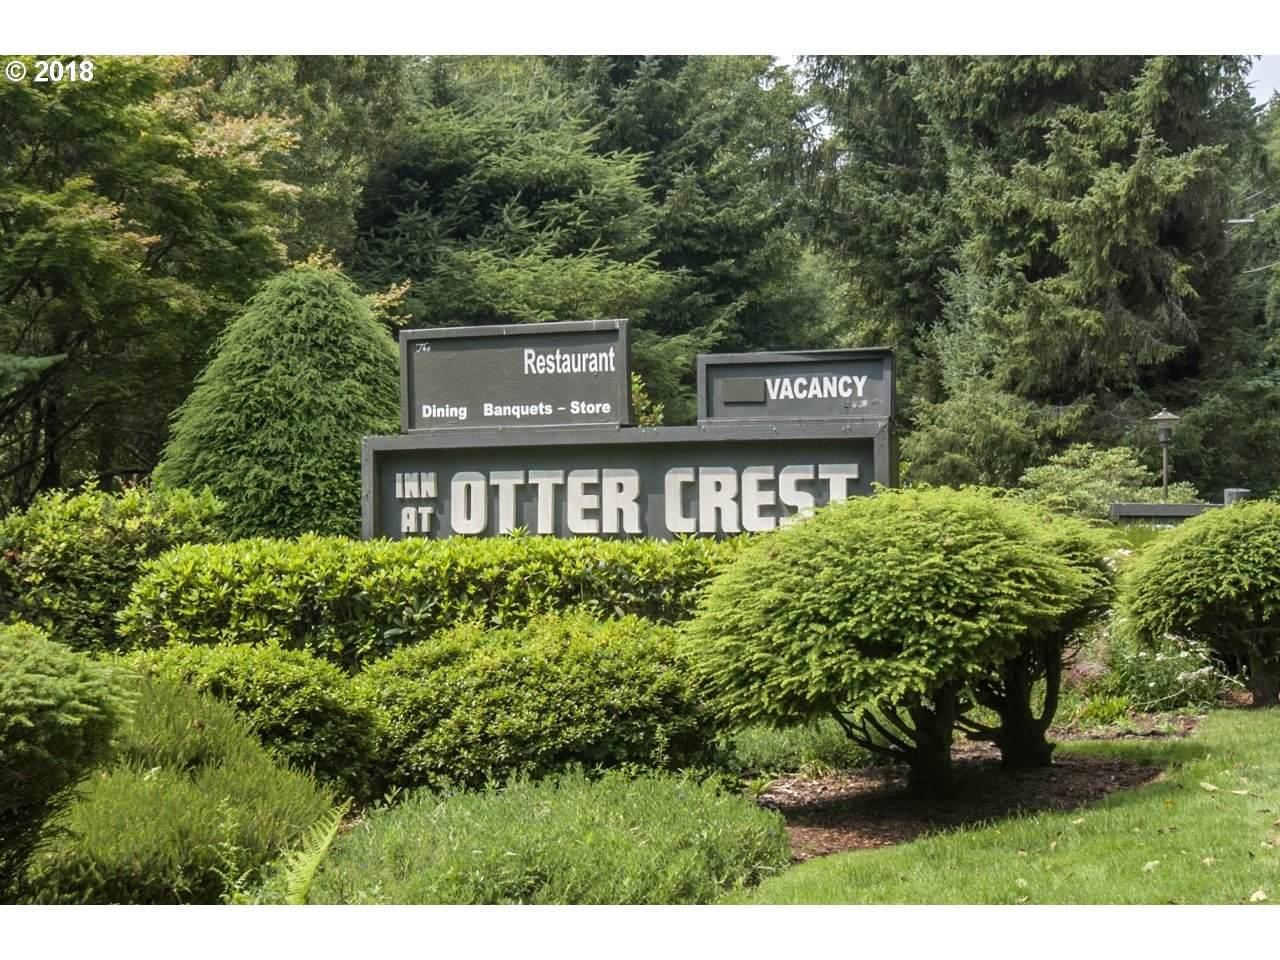 301 Otter Crest Dr - Photo 1